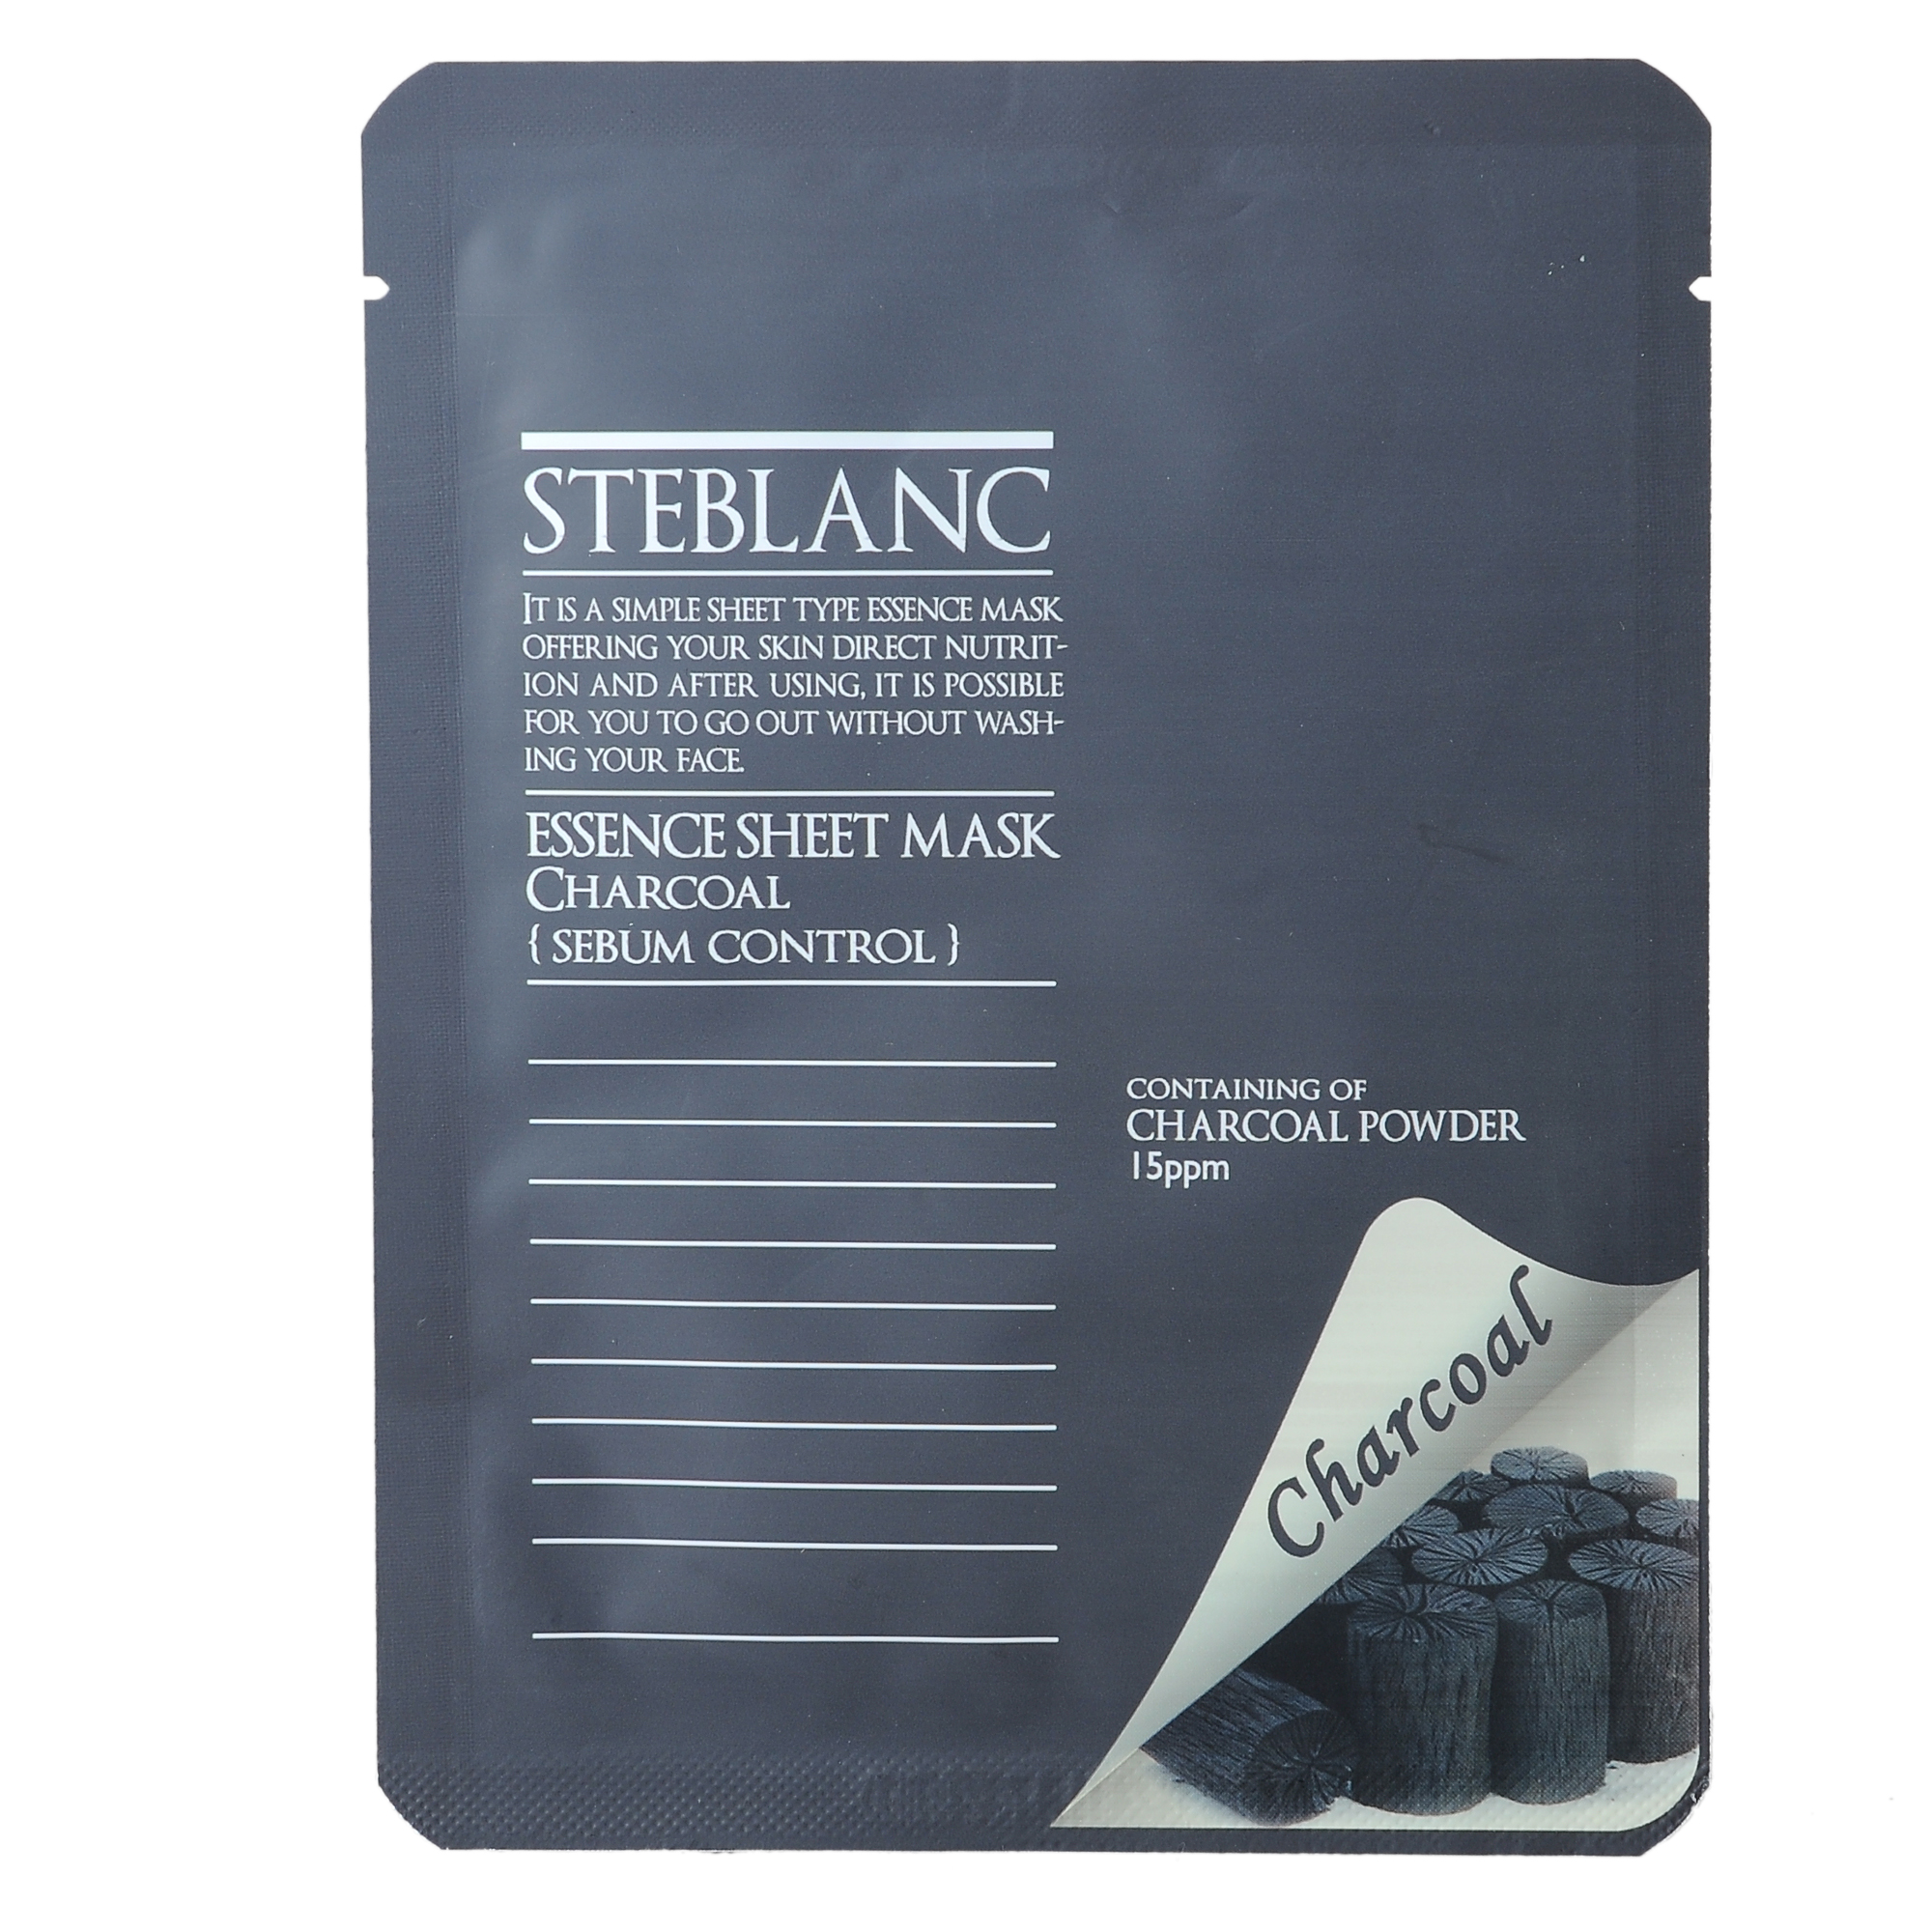 STEBLANC Маска адсорбирующая на основе древесного угля для лица / ESSENCE SHEET MASK 20гр